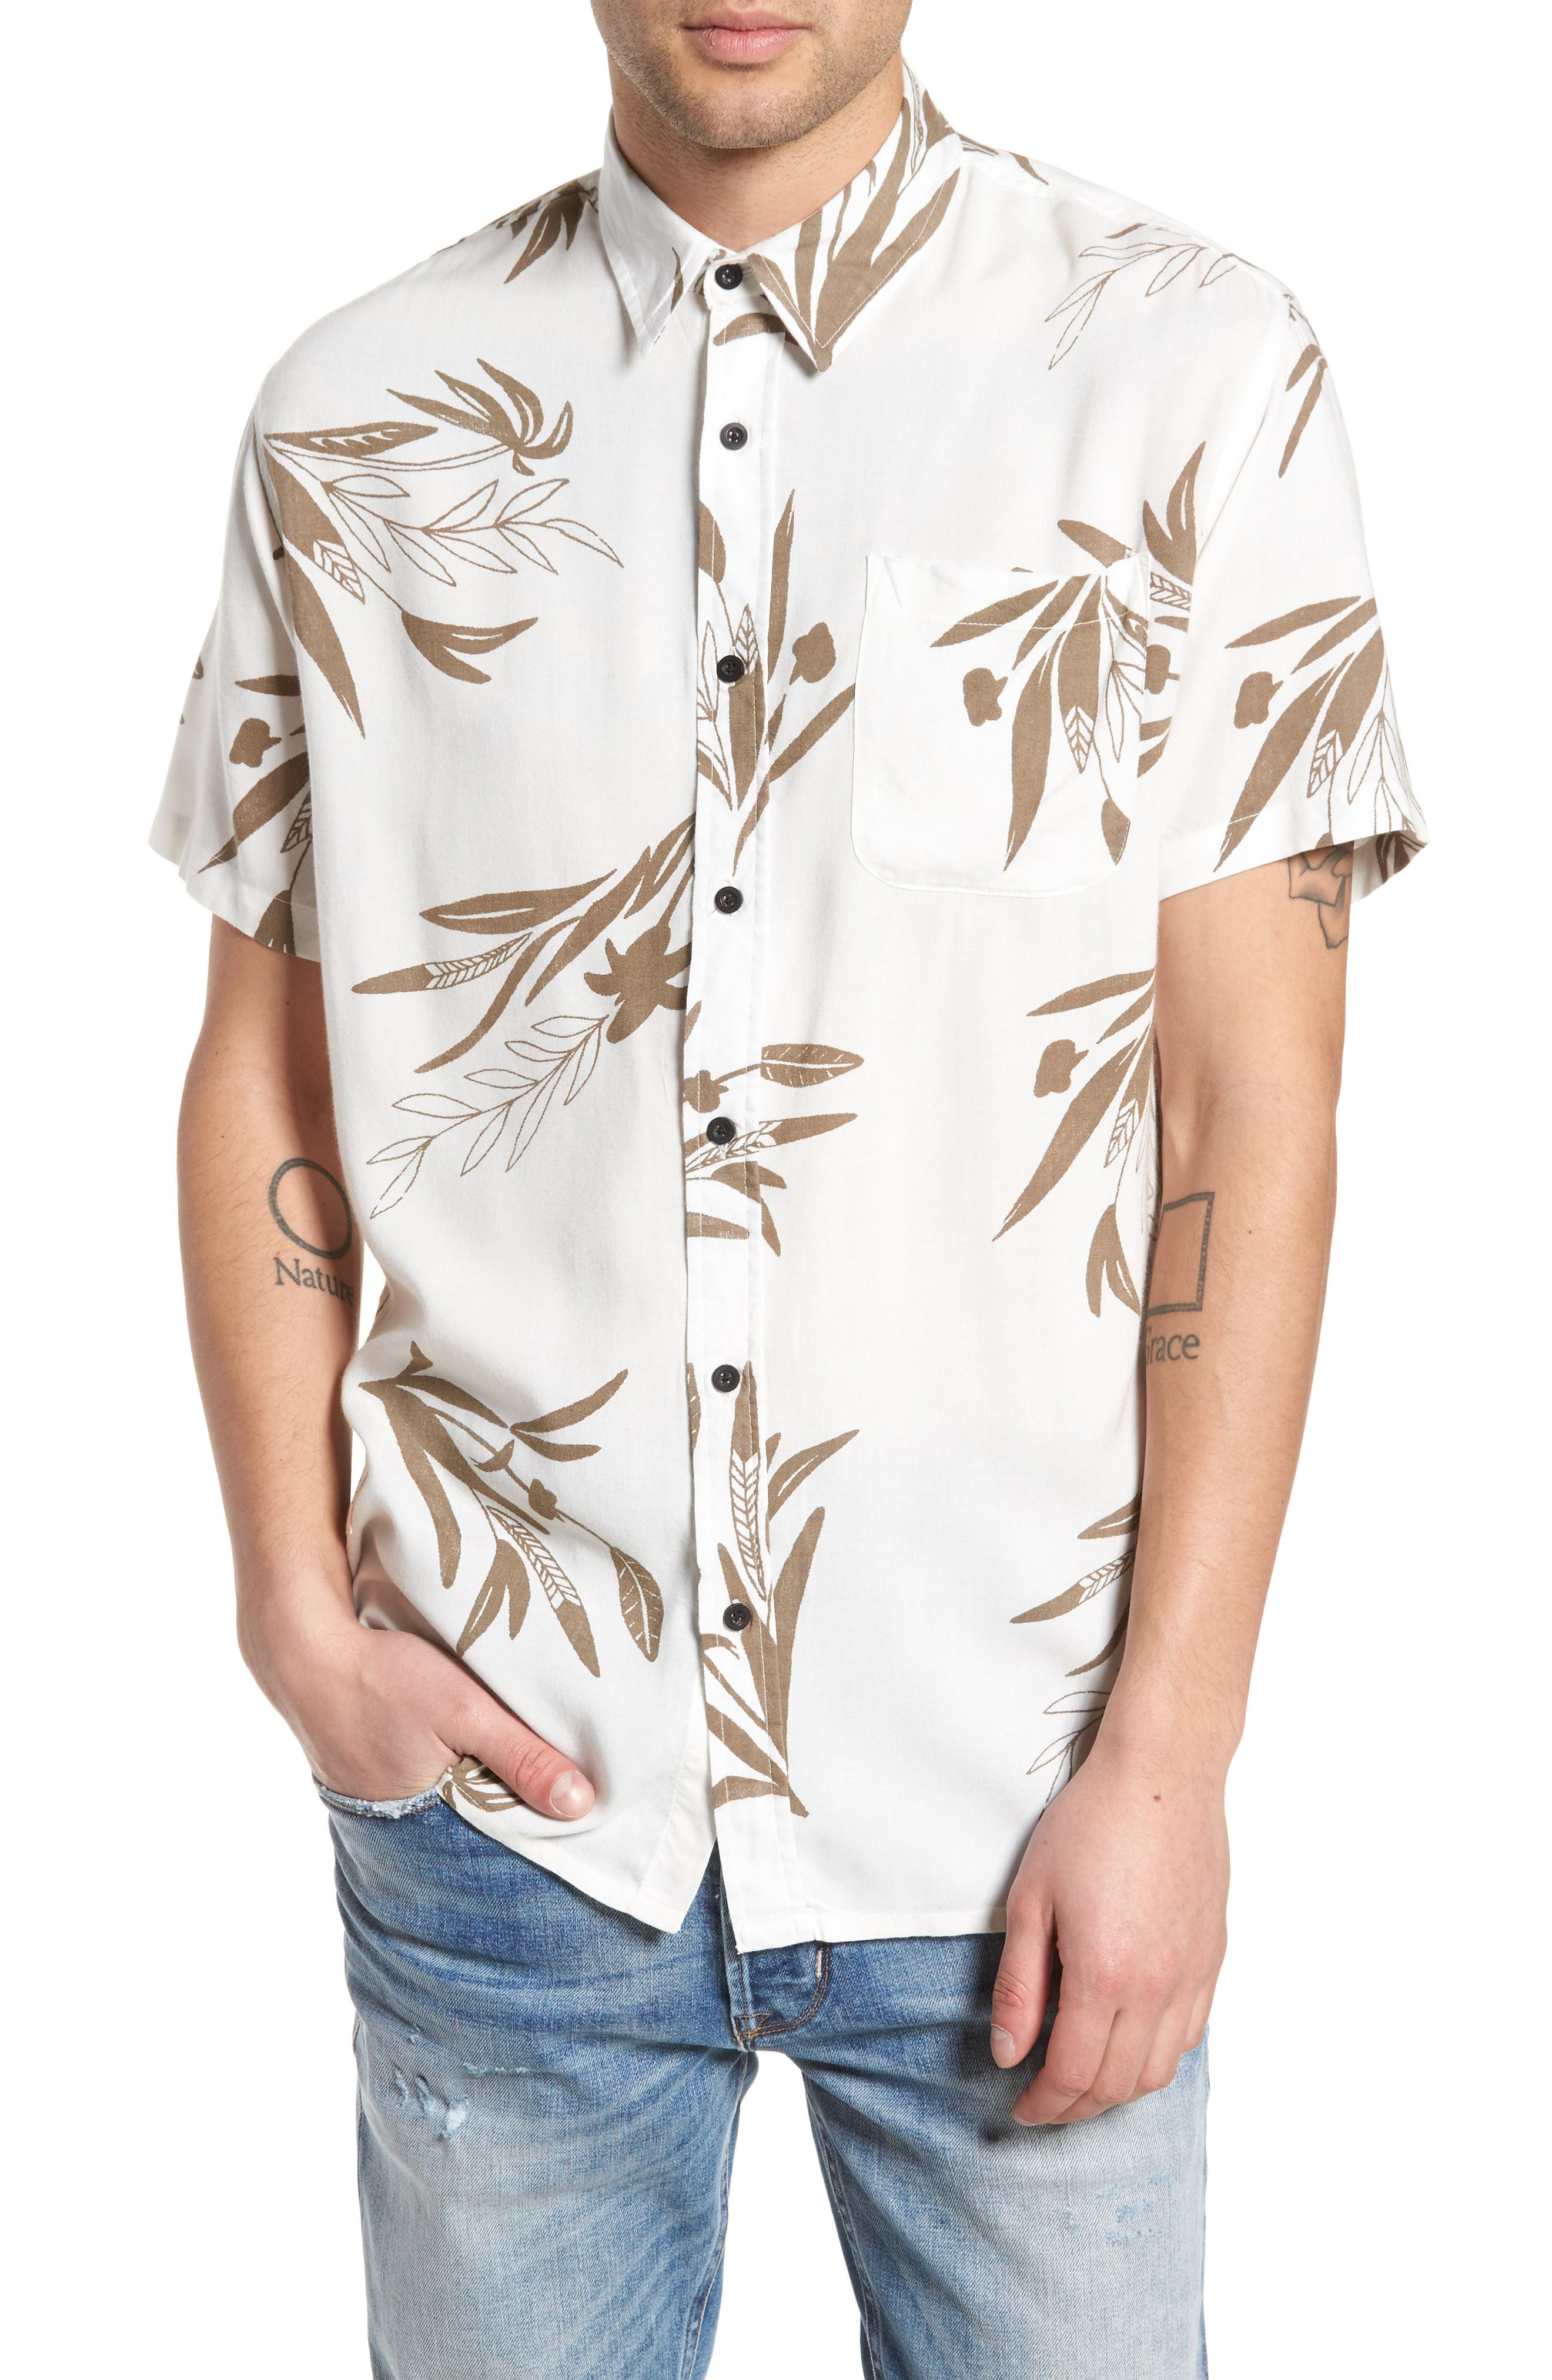 Lira Clothing Simmer Short Sleeve Shirt